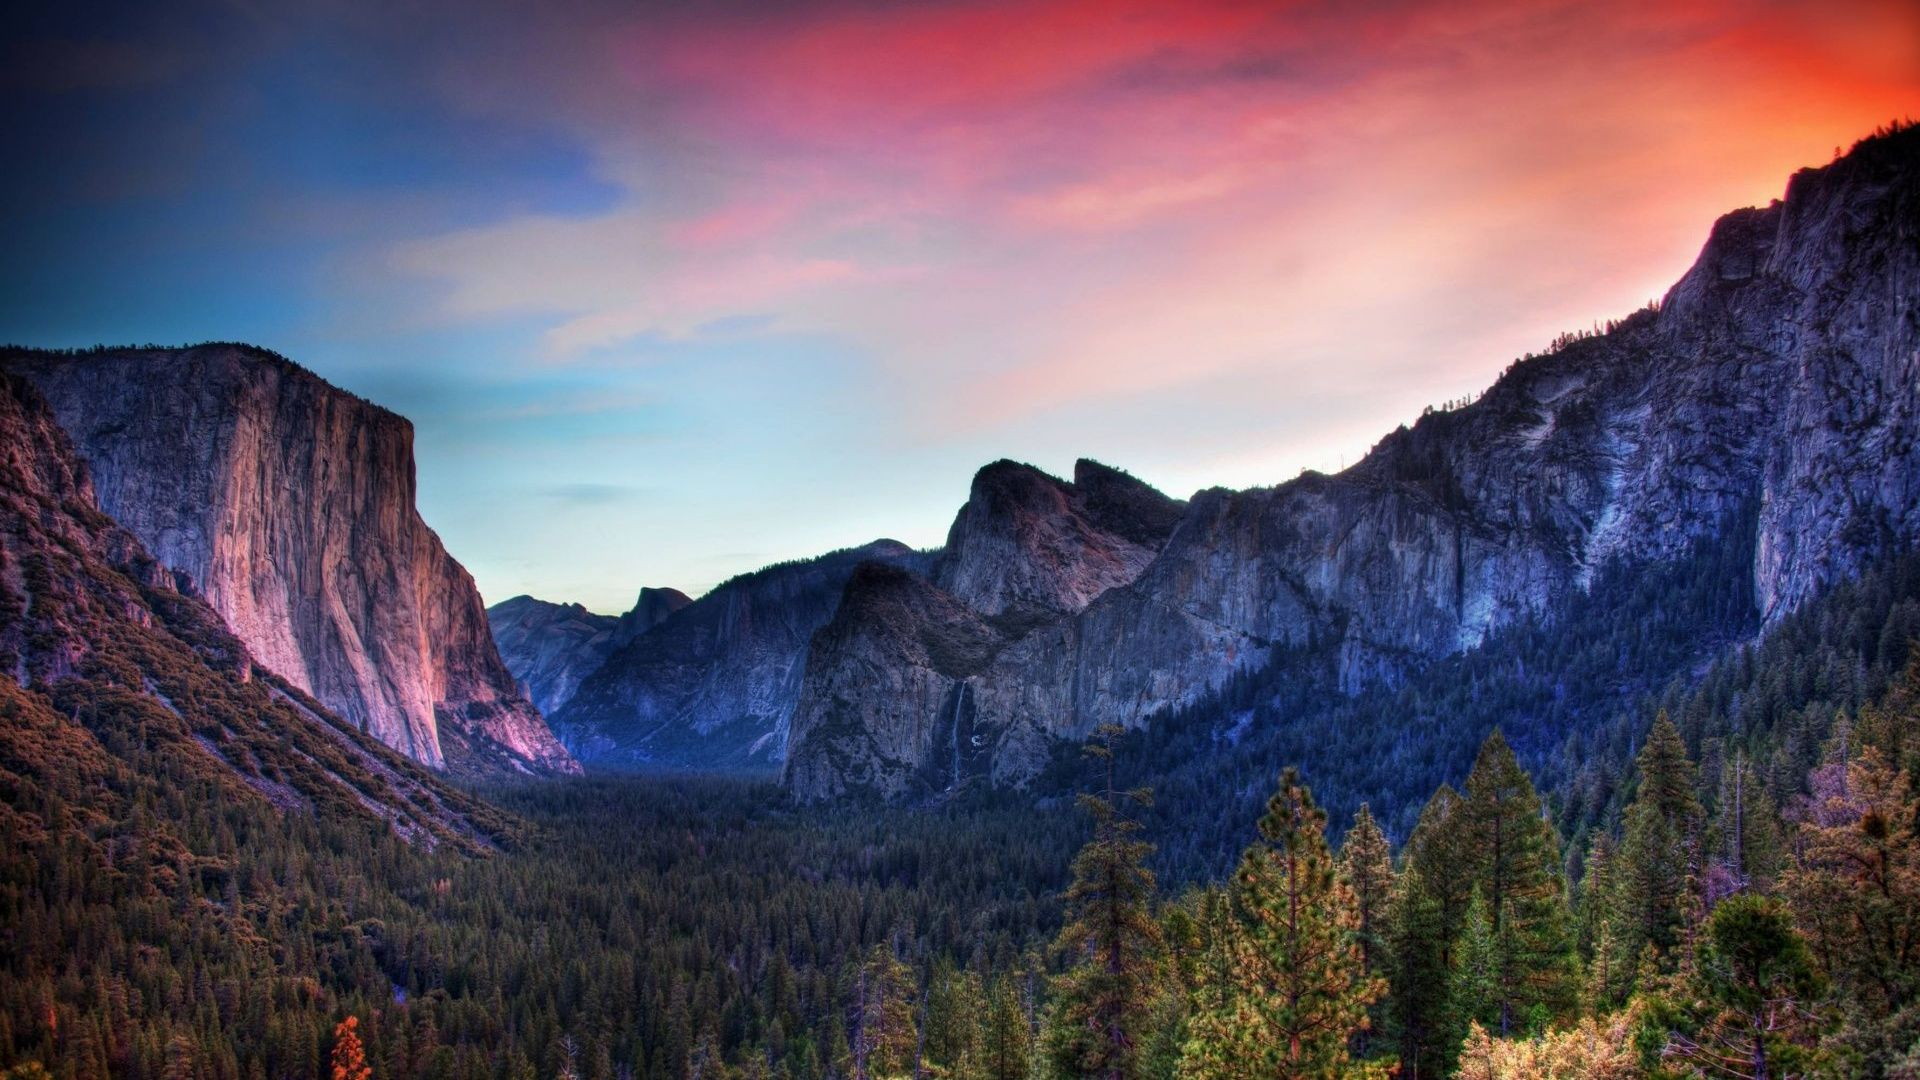 HD Hintergrundbilder sonnenuntergang berge felsen himmel ...